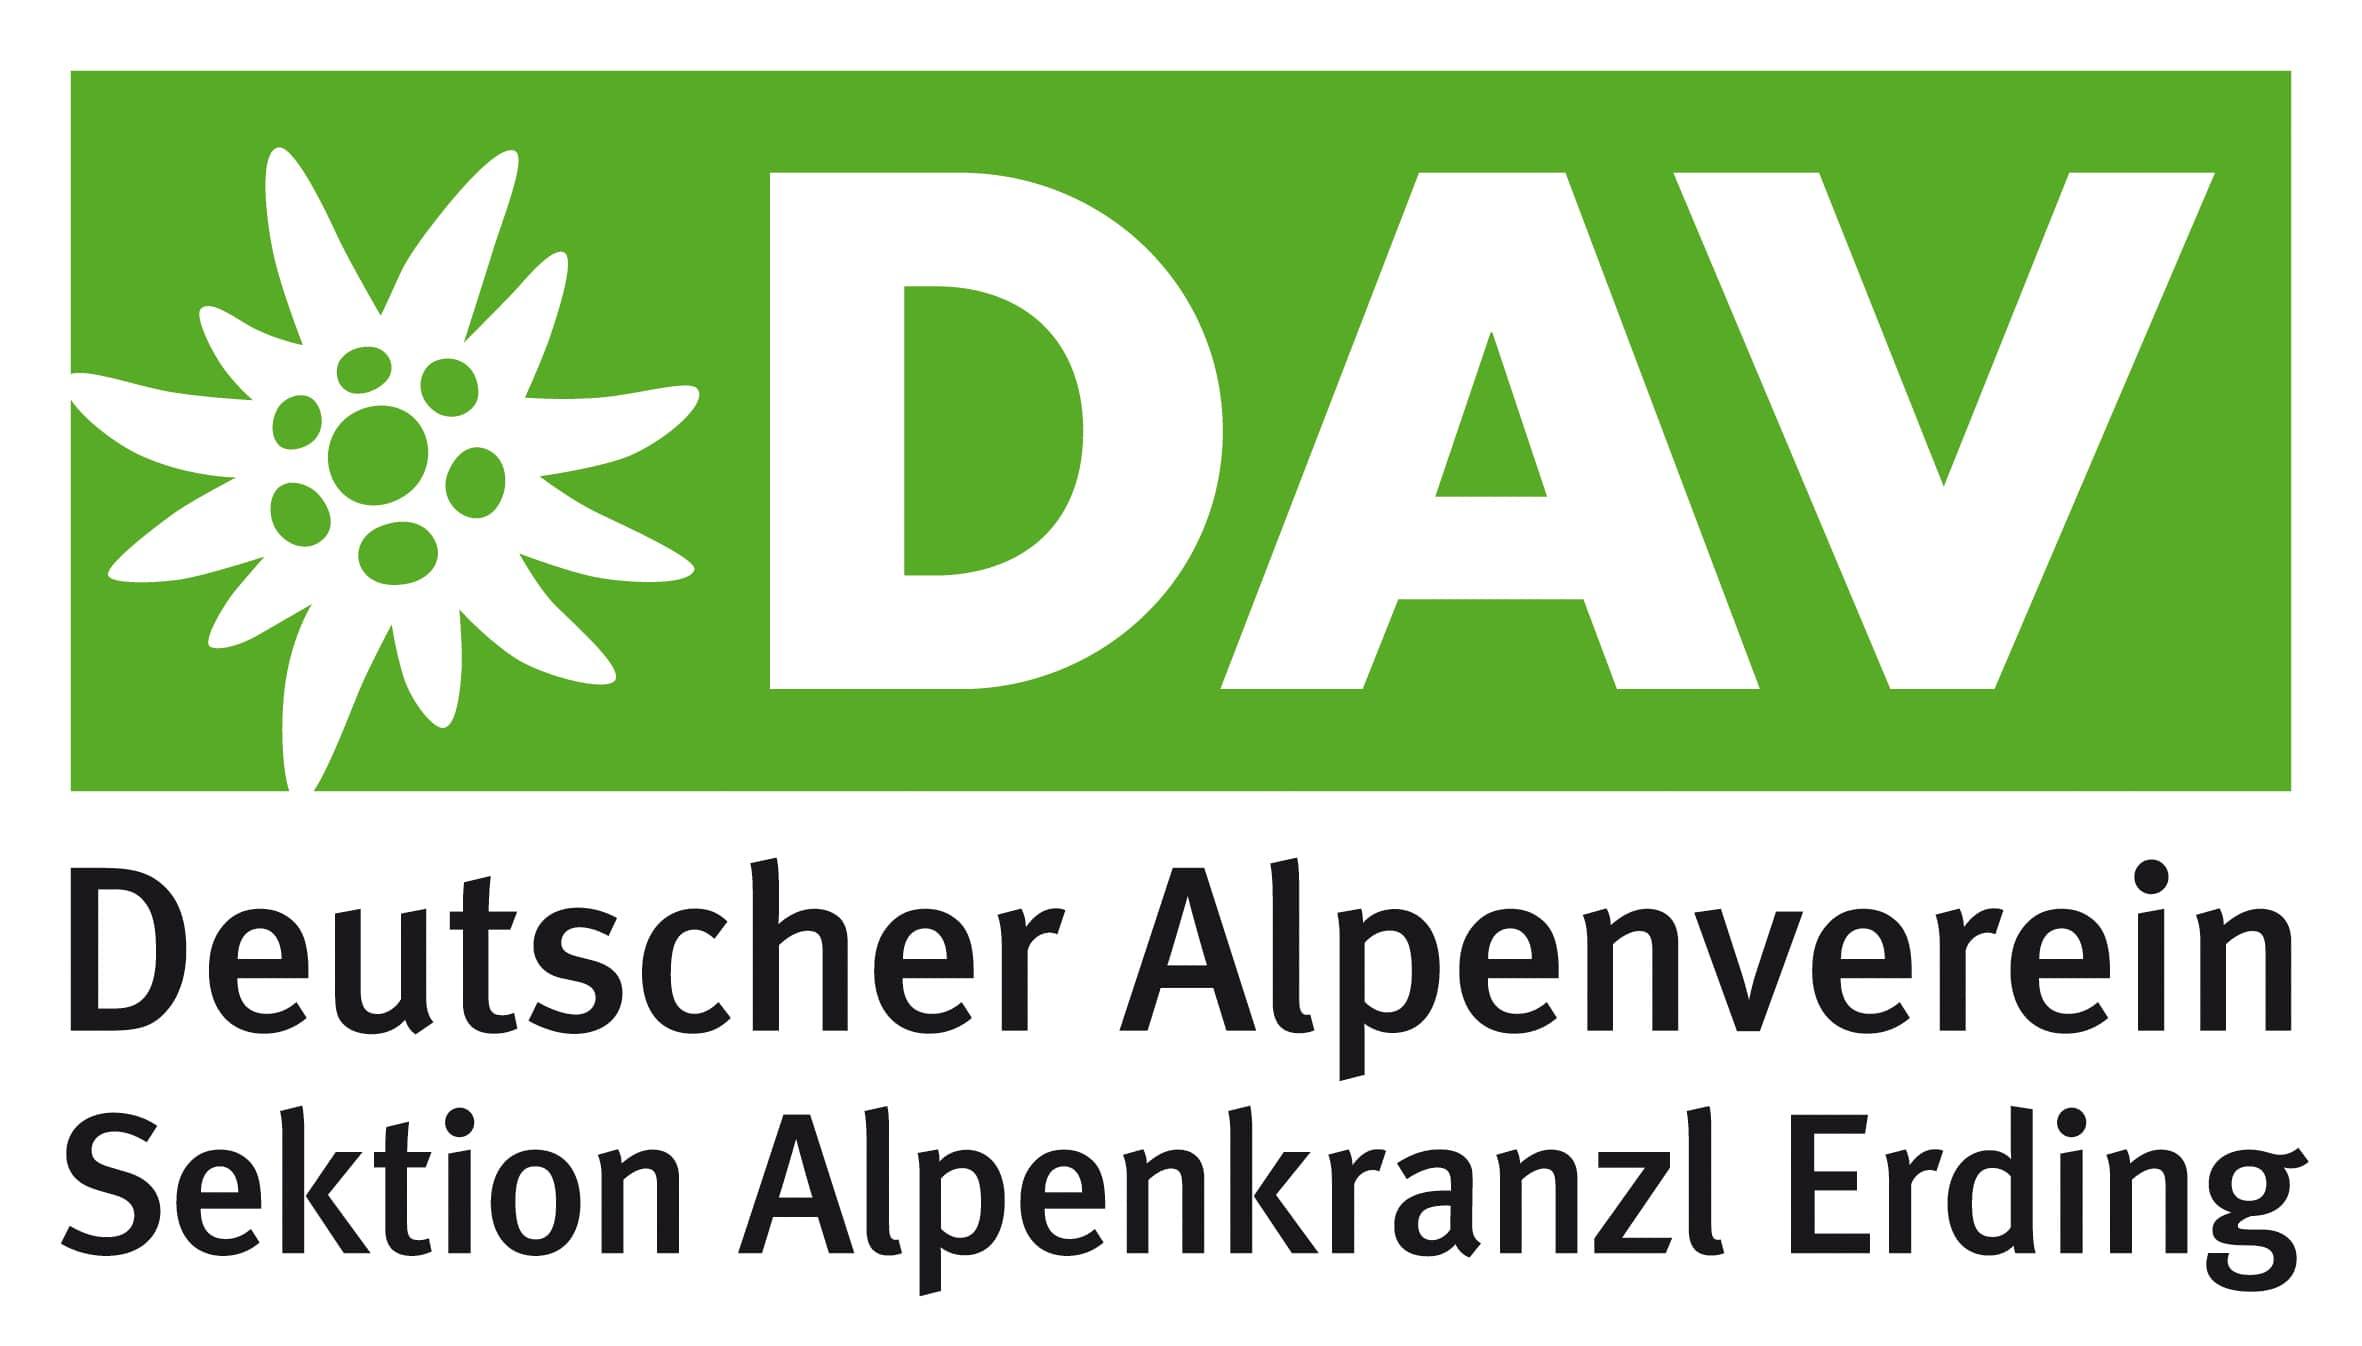 Alpenkranzl goes digital